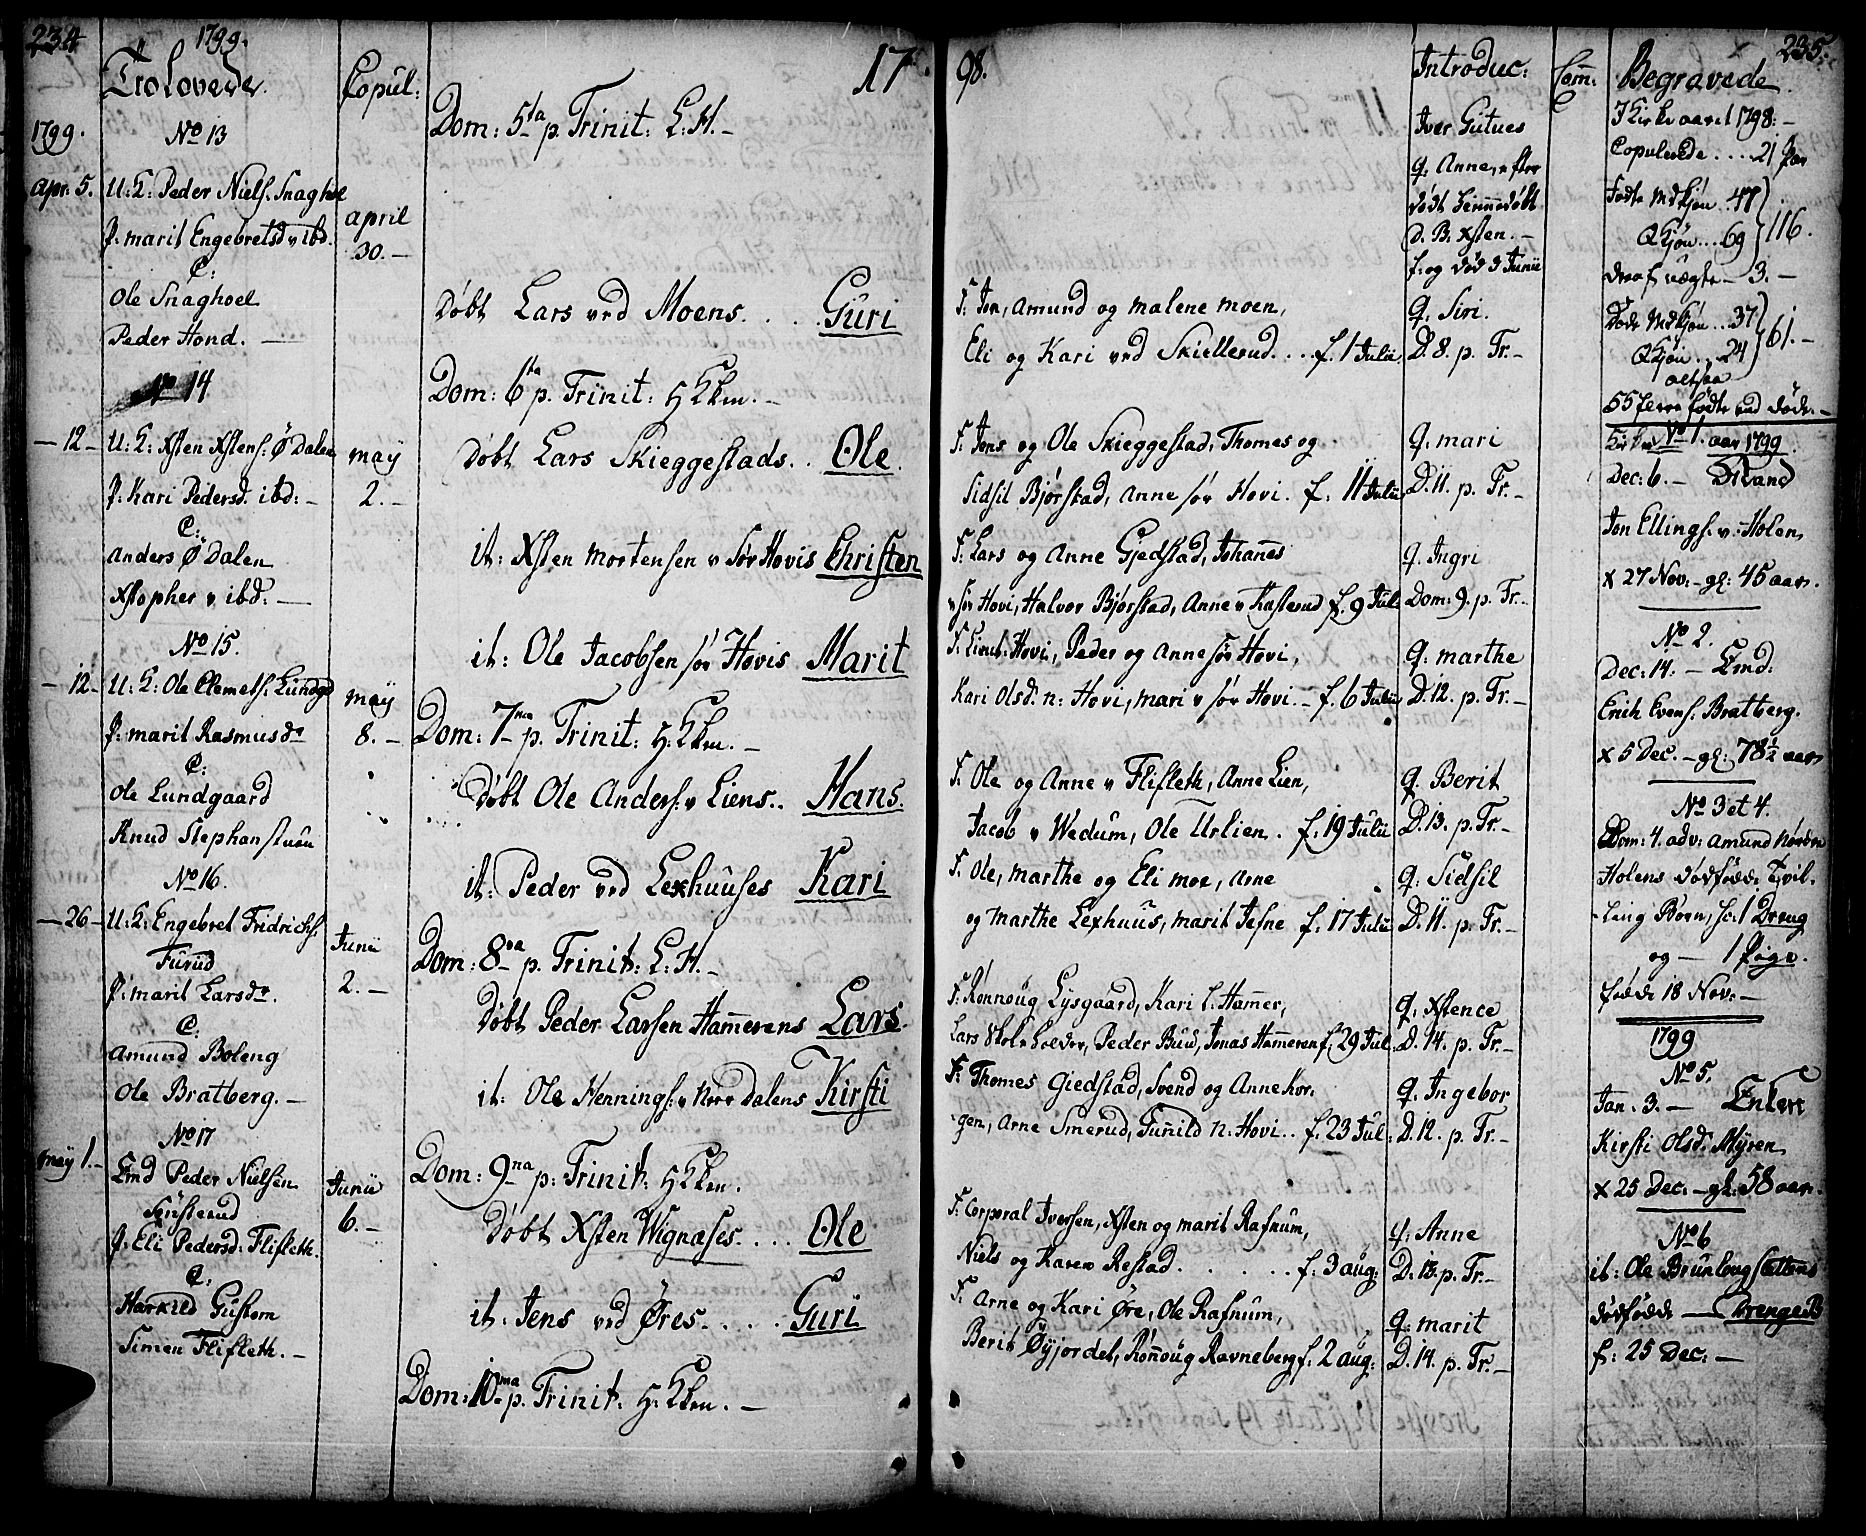 SAH, Fåberg prestekontor, Ministerialbok nr. 2, 1775-1818, s. 234-235